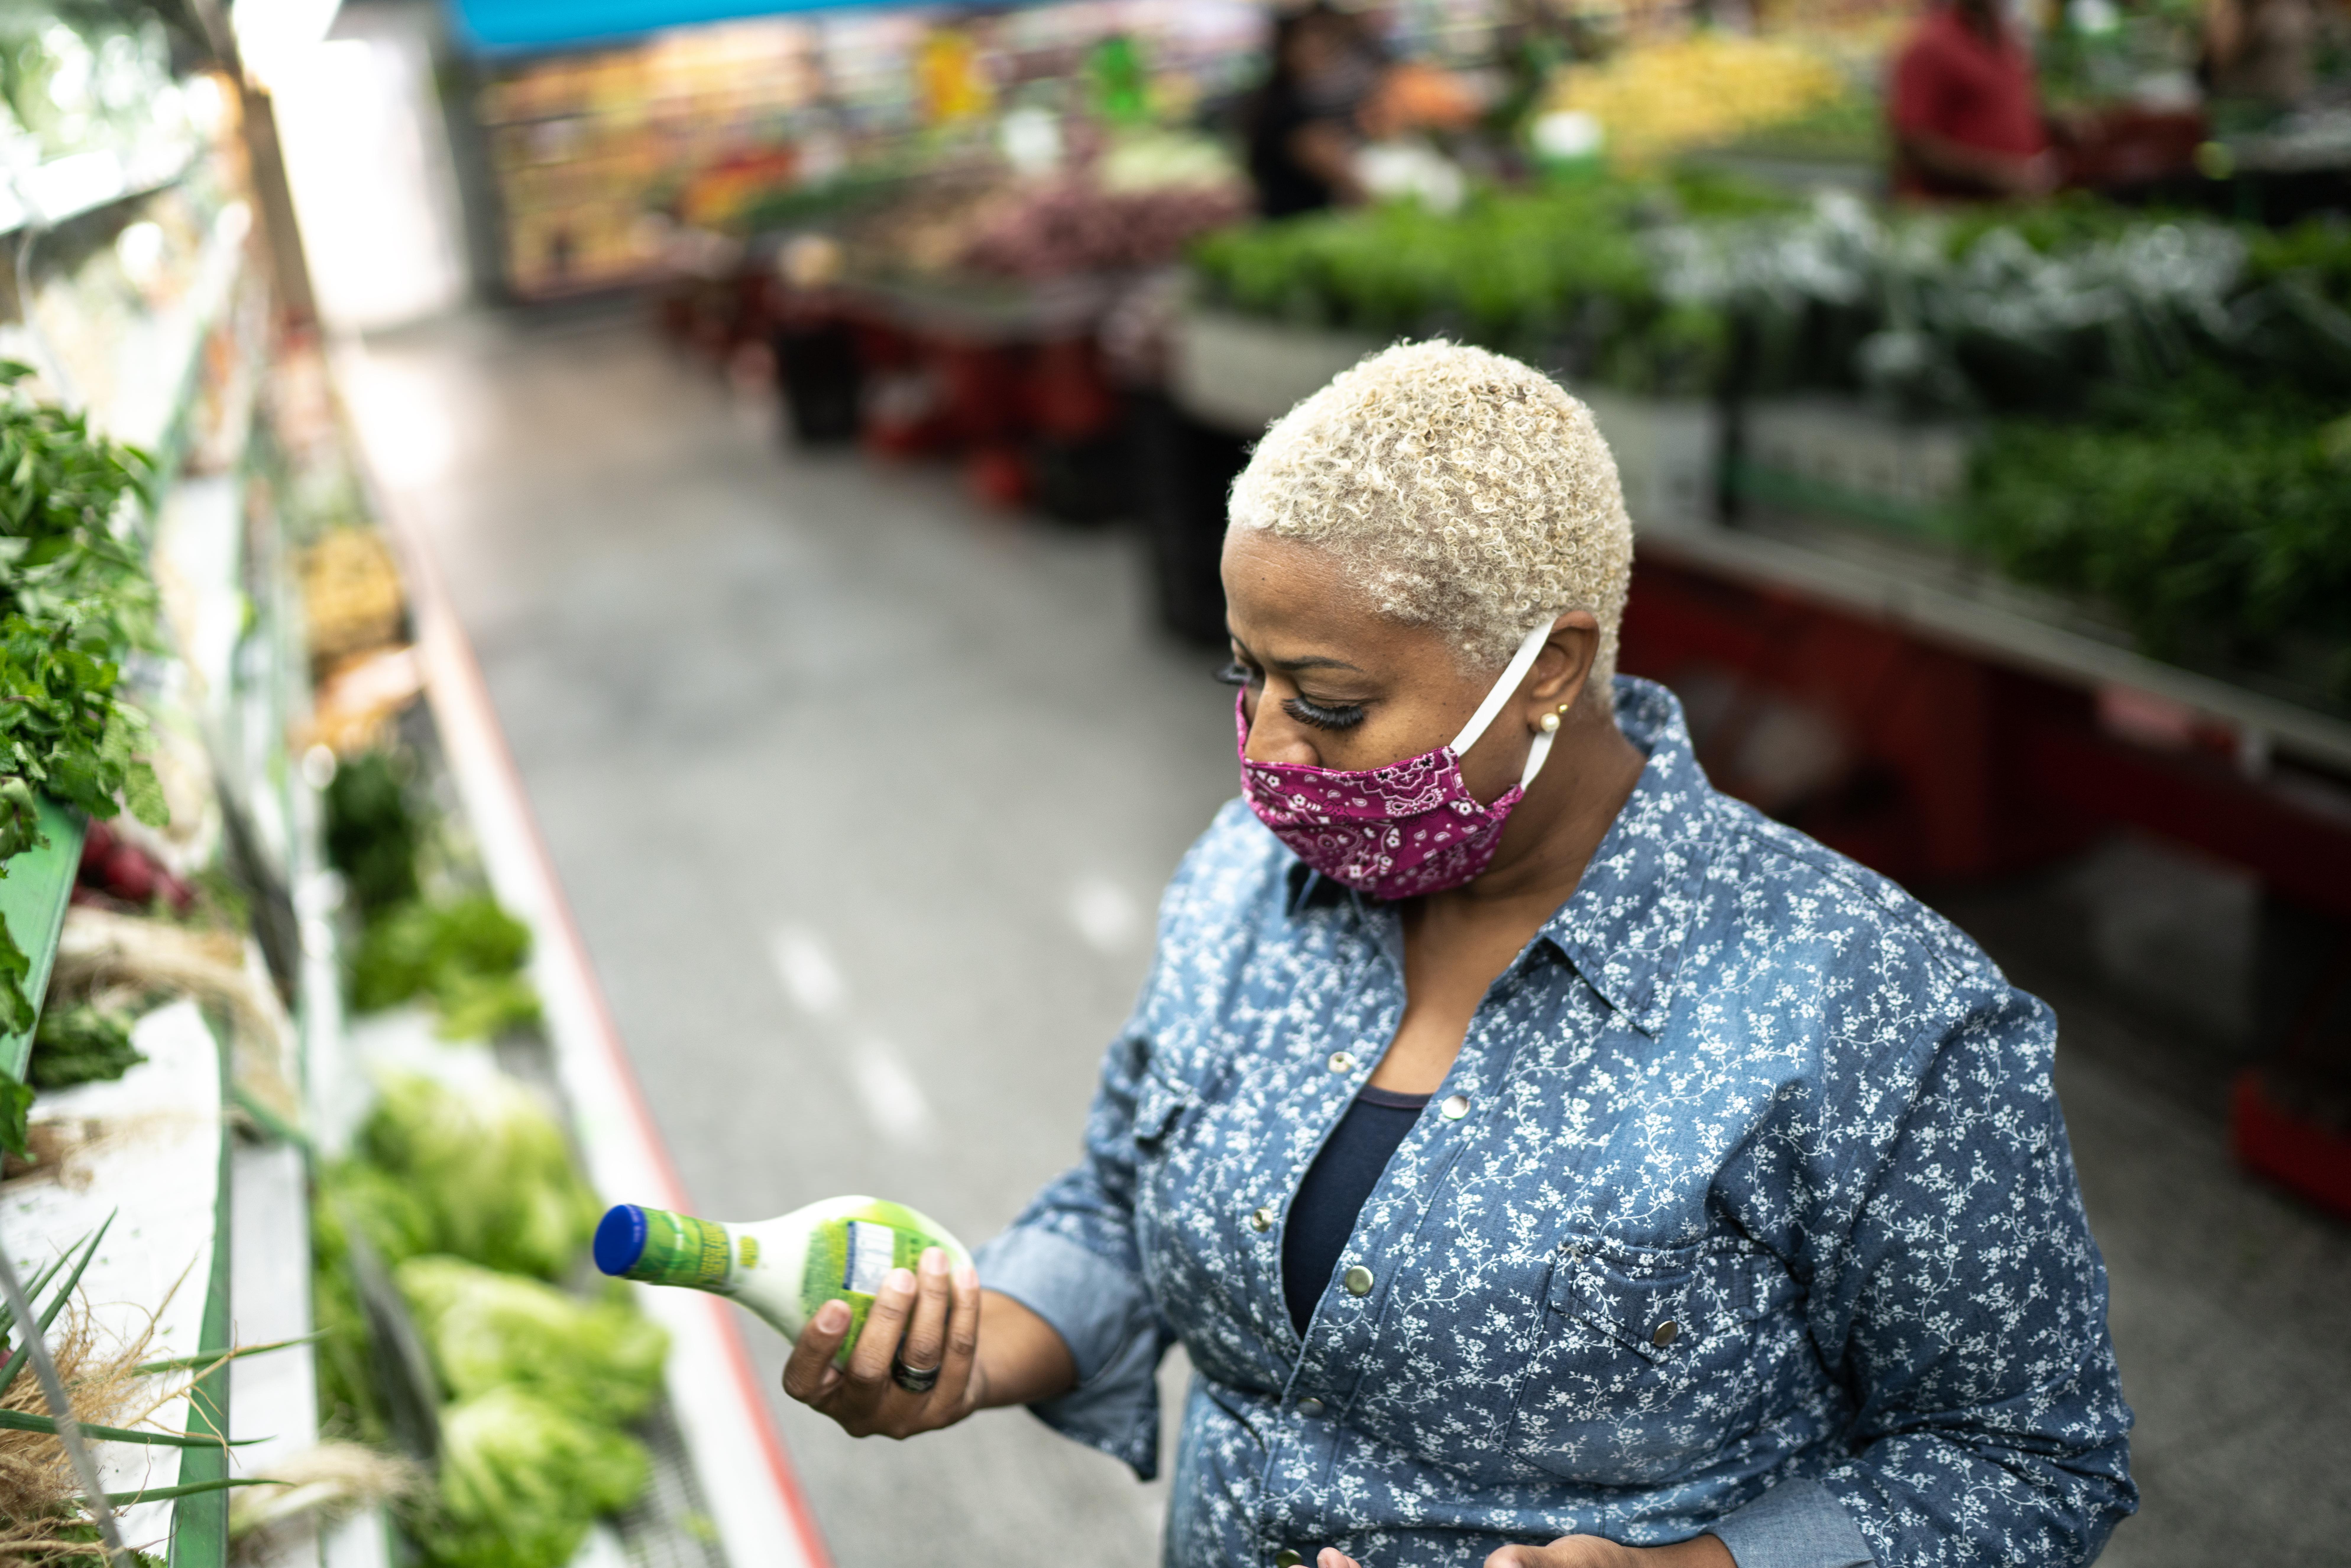 Coronavirus grocery shopping safety tips